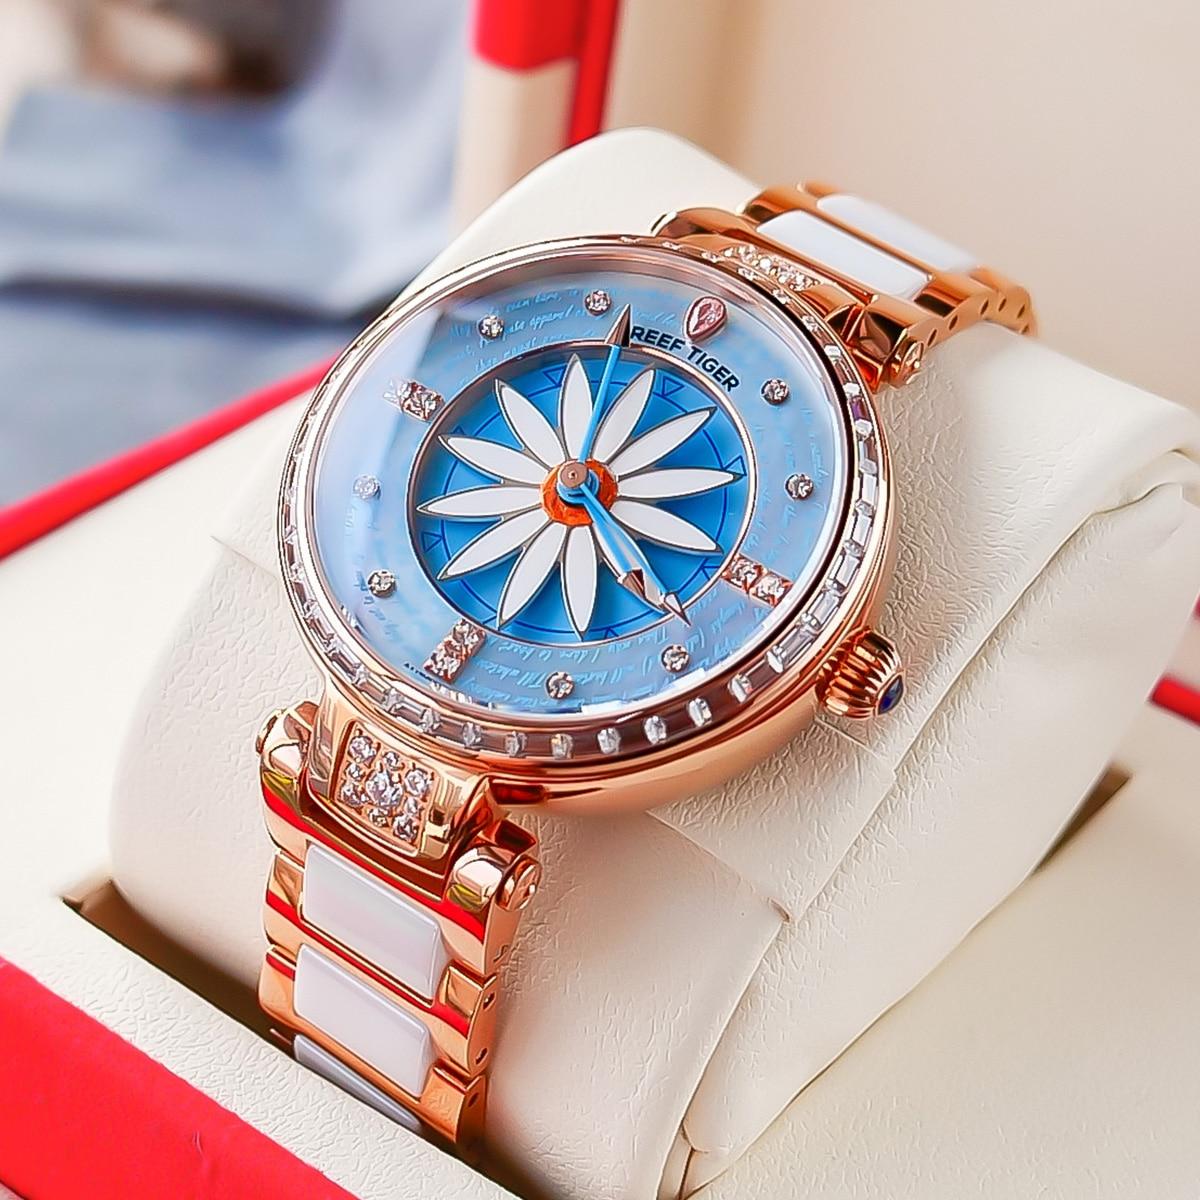 Reef Tiger/RT Fashion Lily Women Watch Rose Gold Diamonds Bezel Lady Automatic Watches Relogio Feminino RGA1599